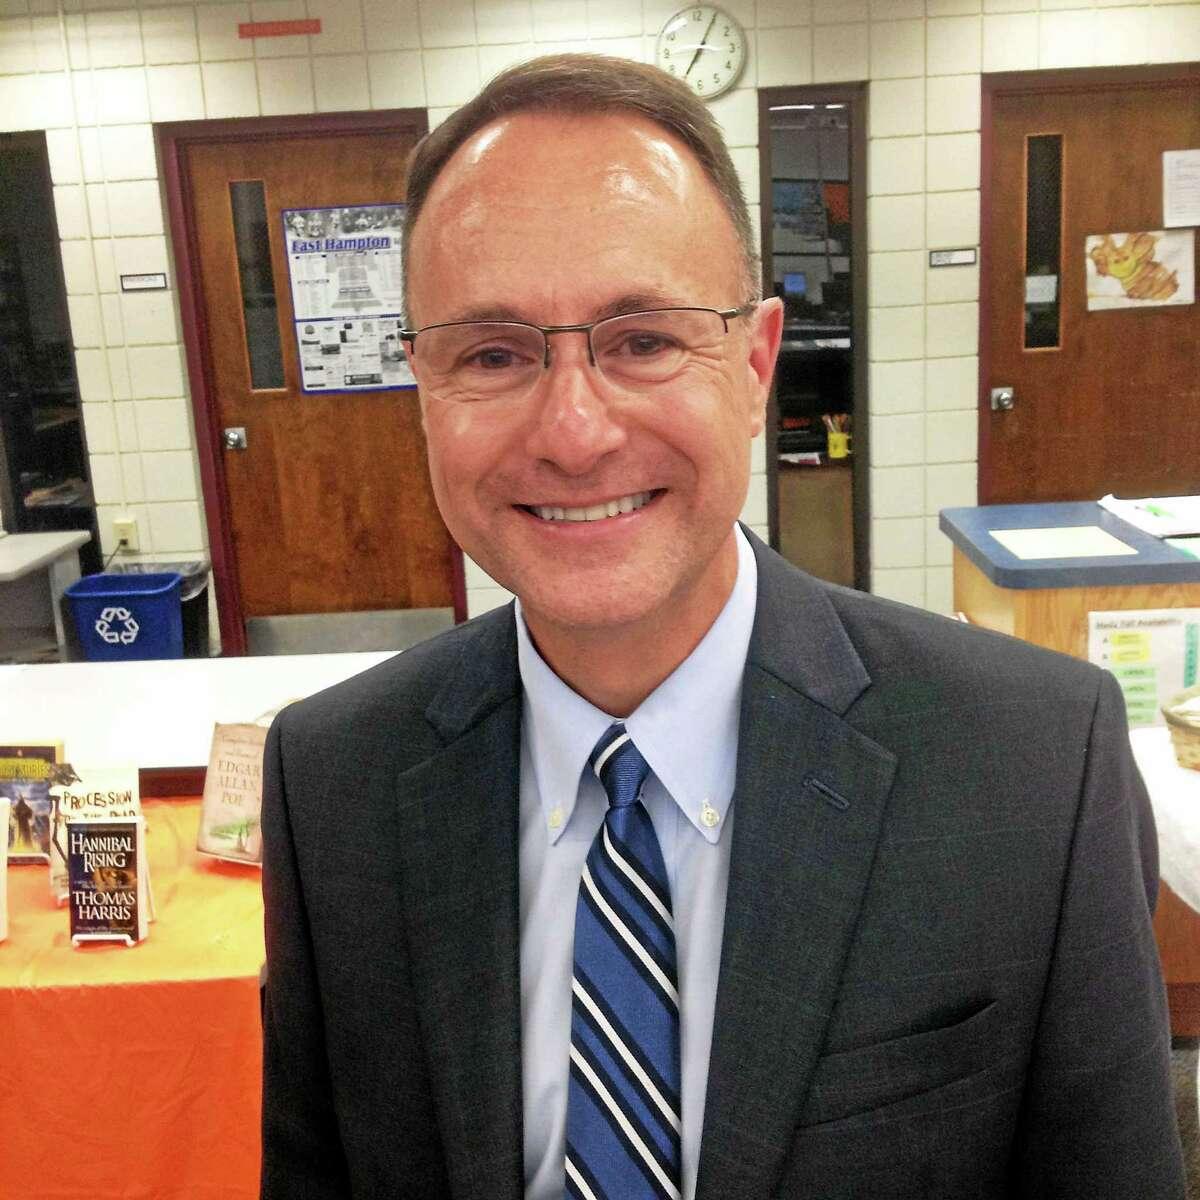 East Hampton Superintendent of Schools Paul K. Smith